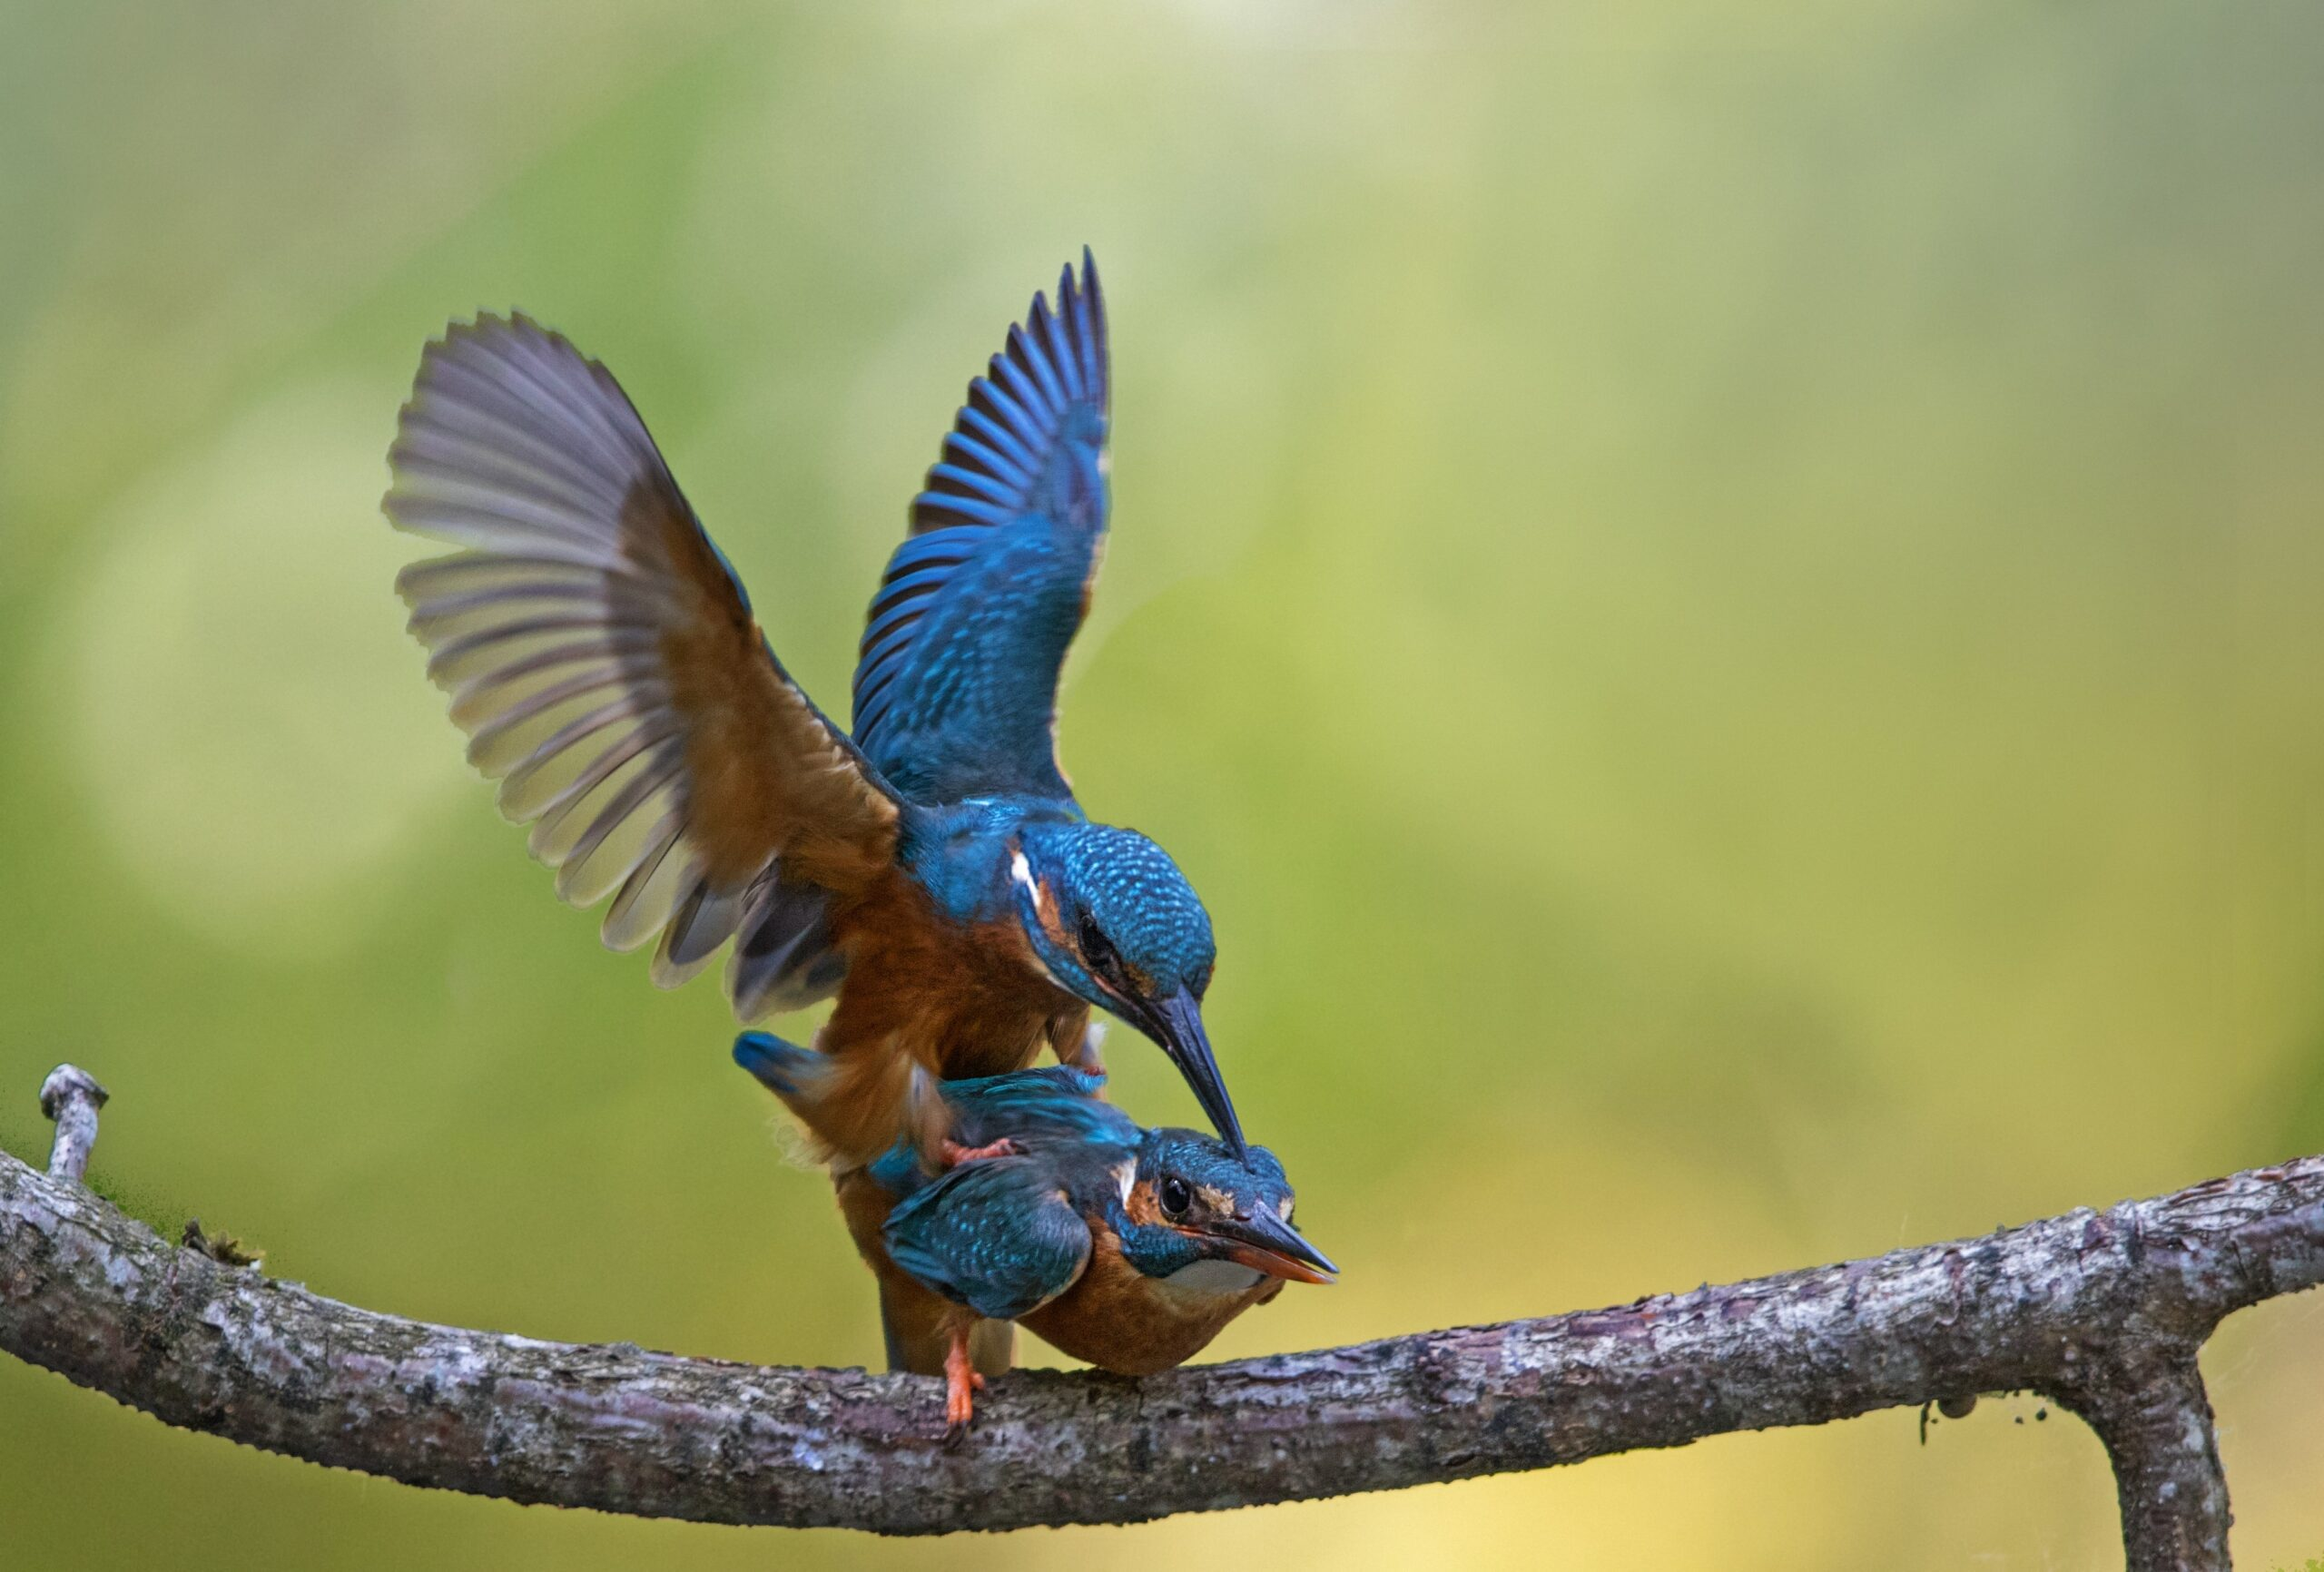 Bluebirds copulating on tree branch by dorothea oldani aldp